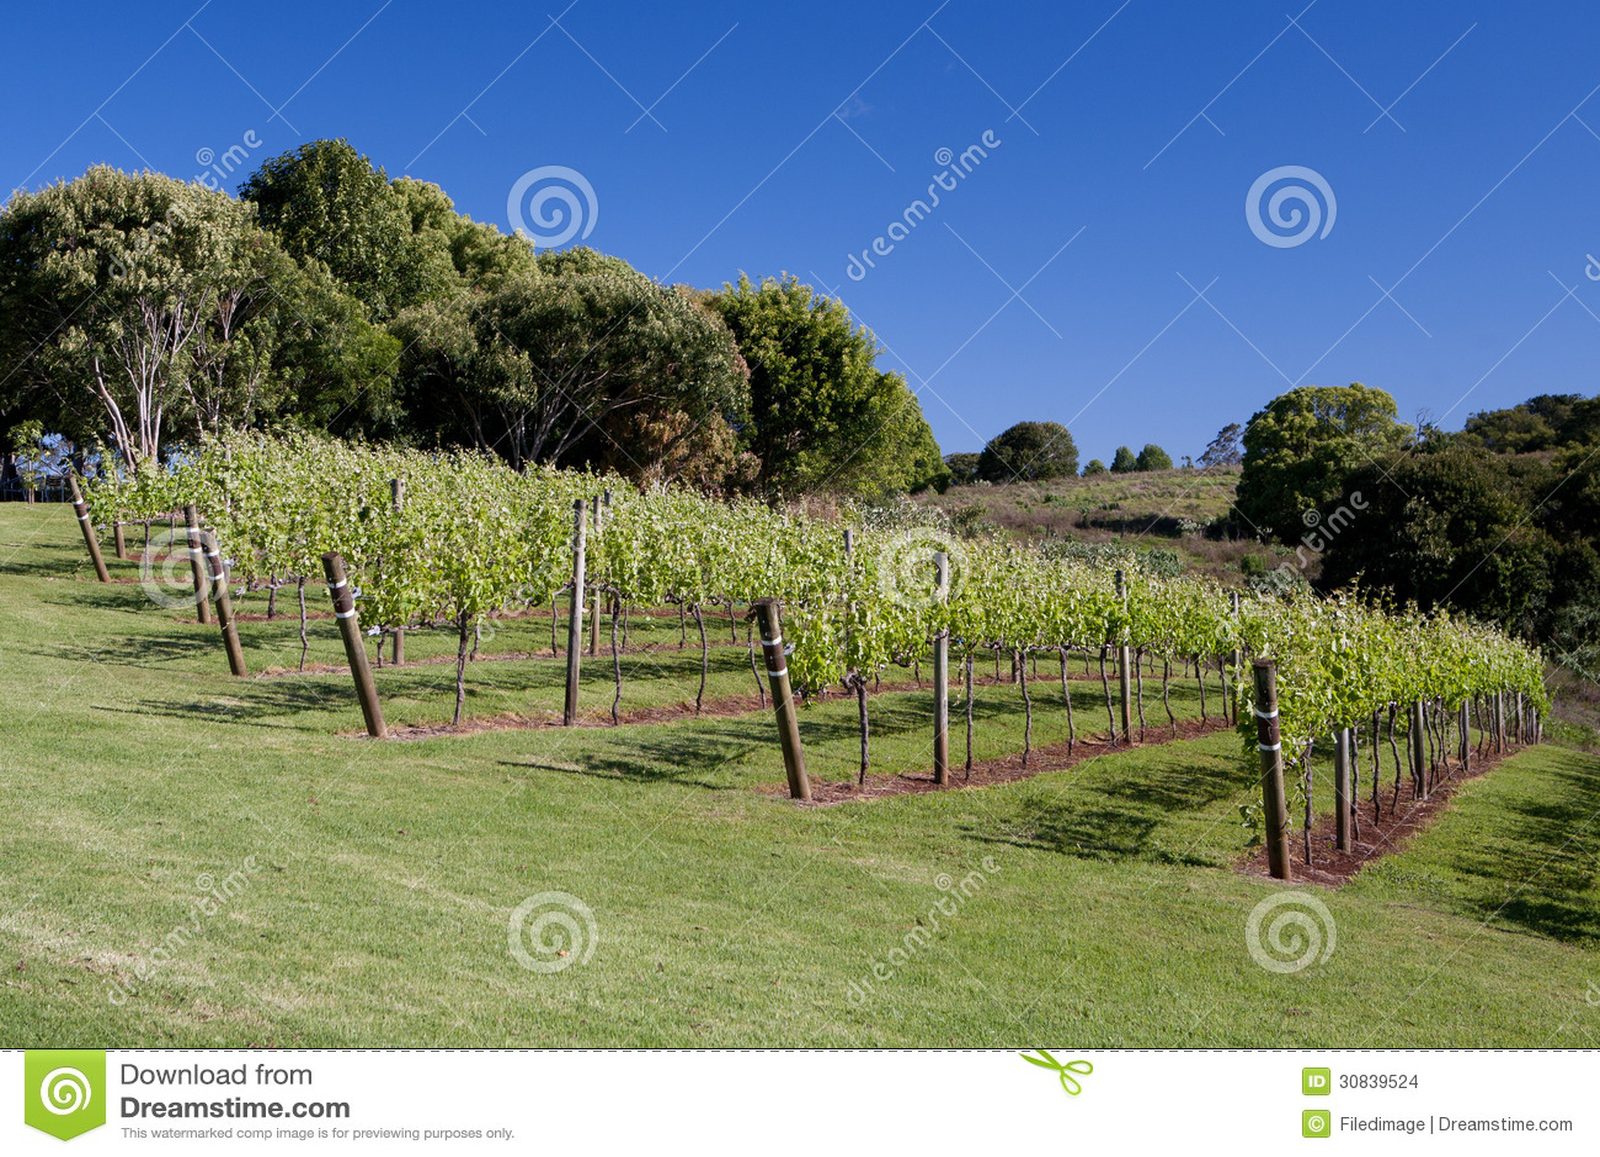 grape vines stock images